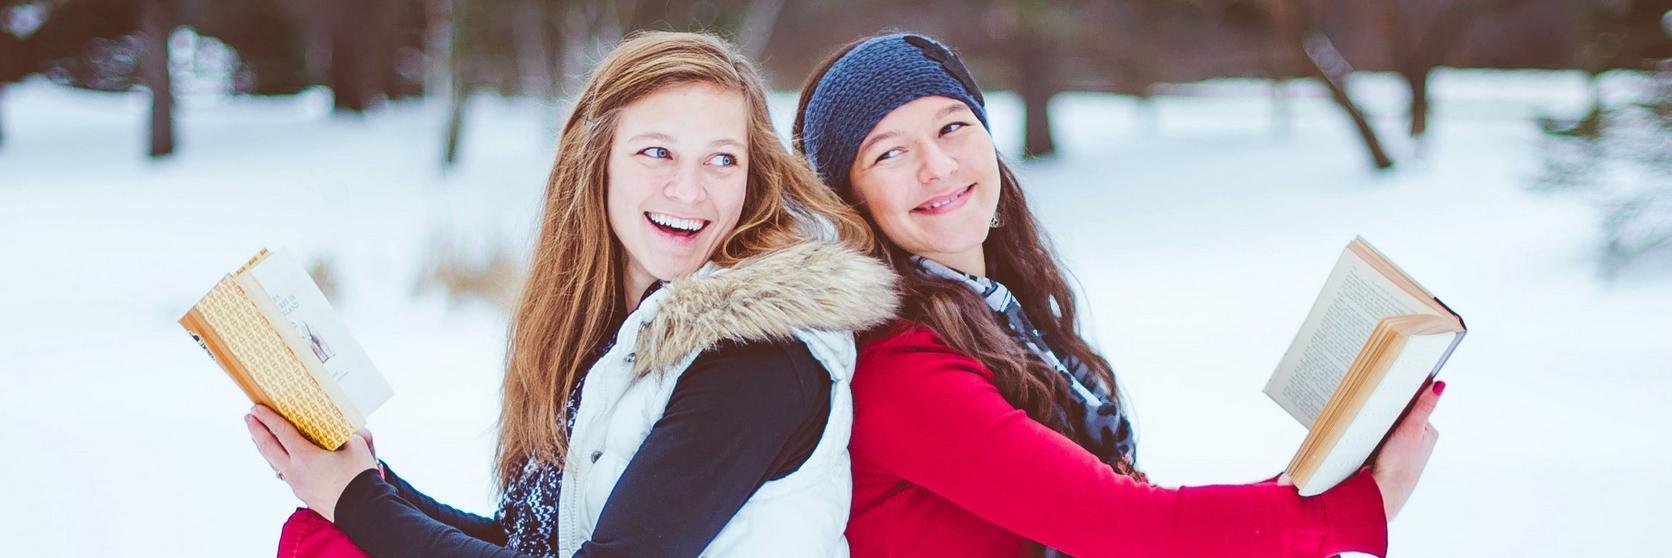 christmas-friends